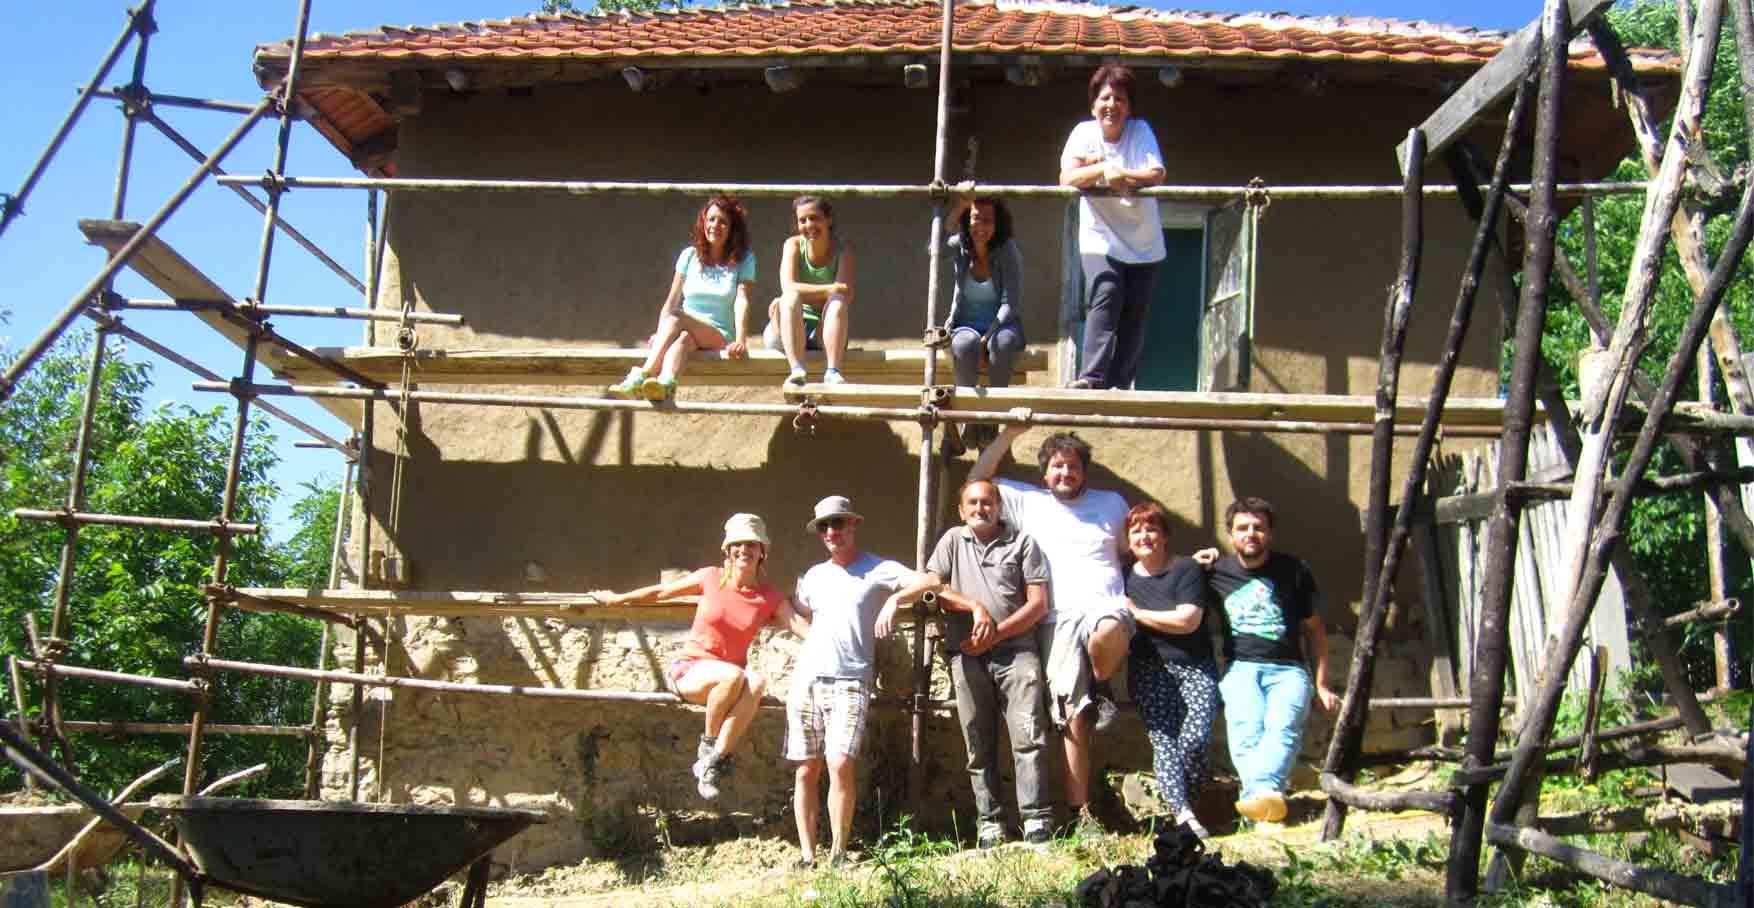 74 Draca radionica jun 2015 Dan 7